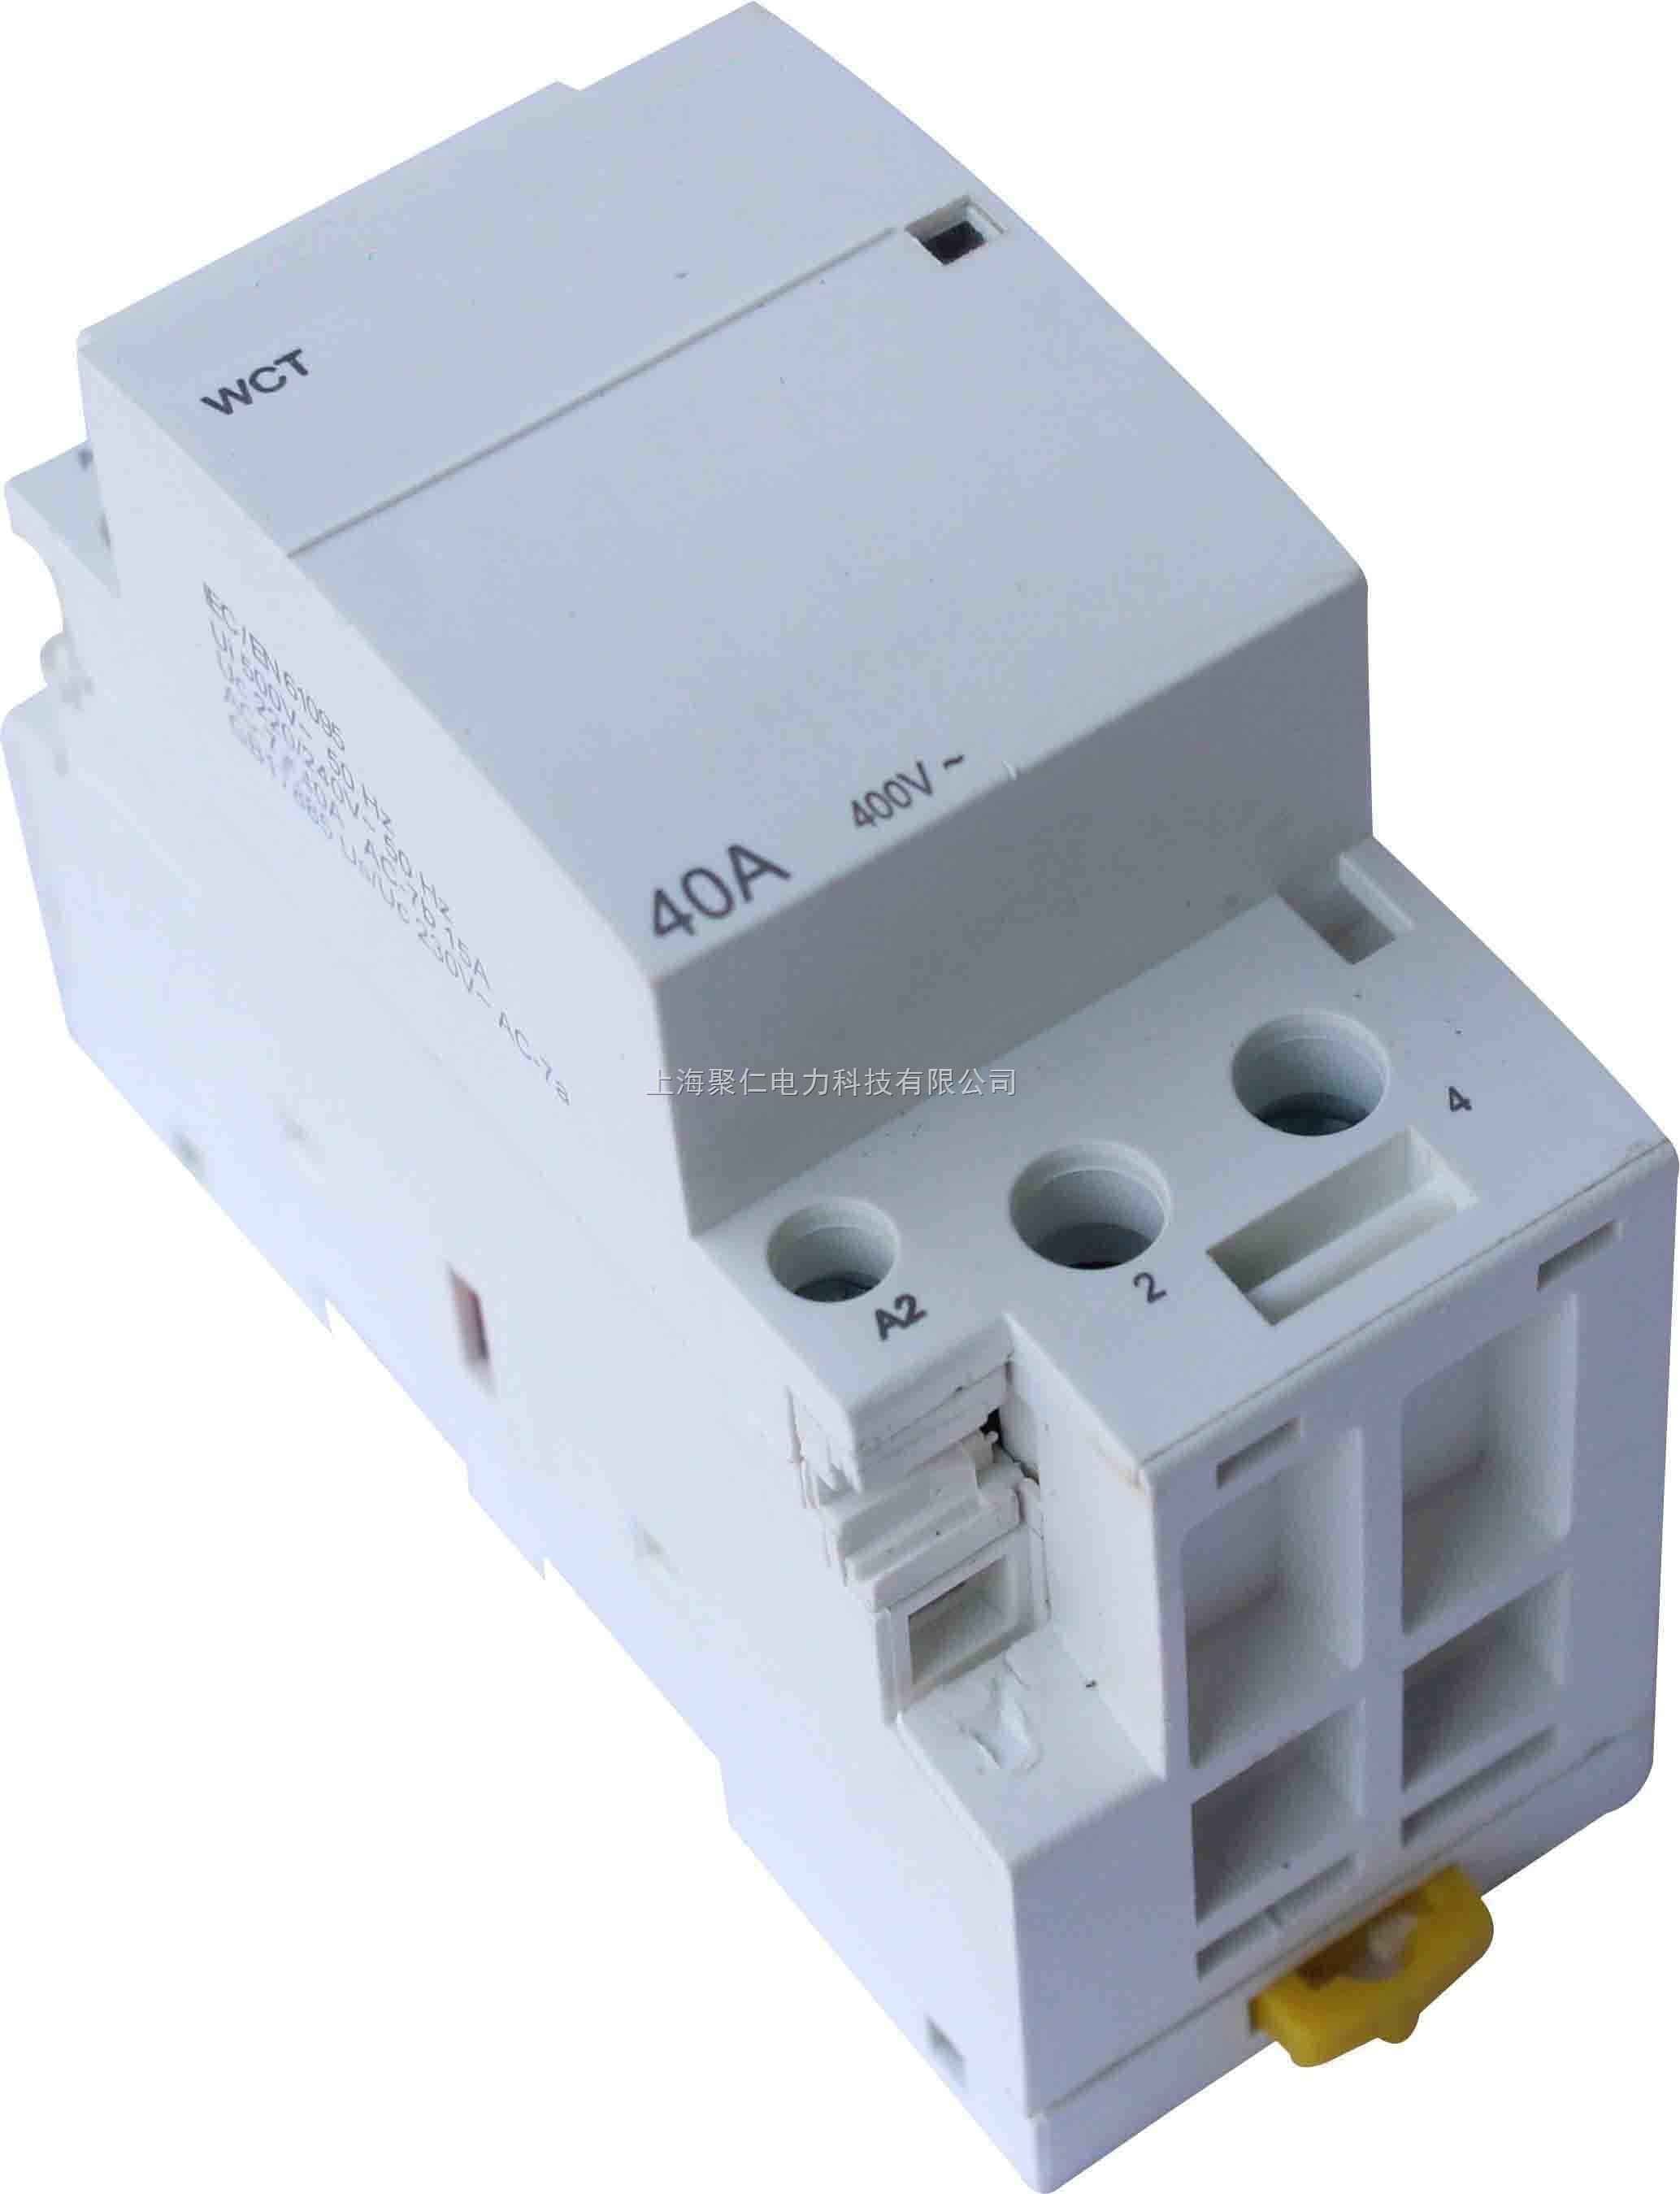 nch8-40/20 低价正泰接触器nch8-40/20_交流接触器原理